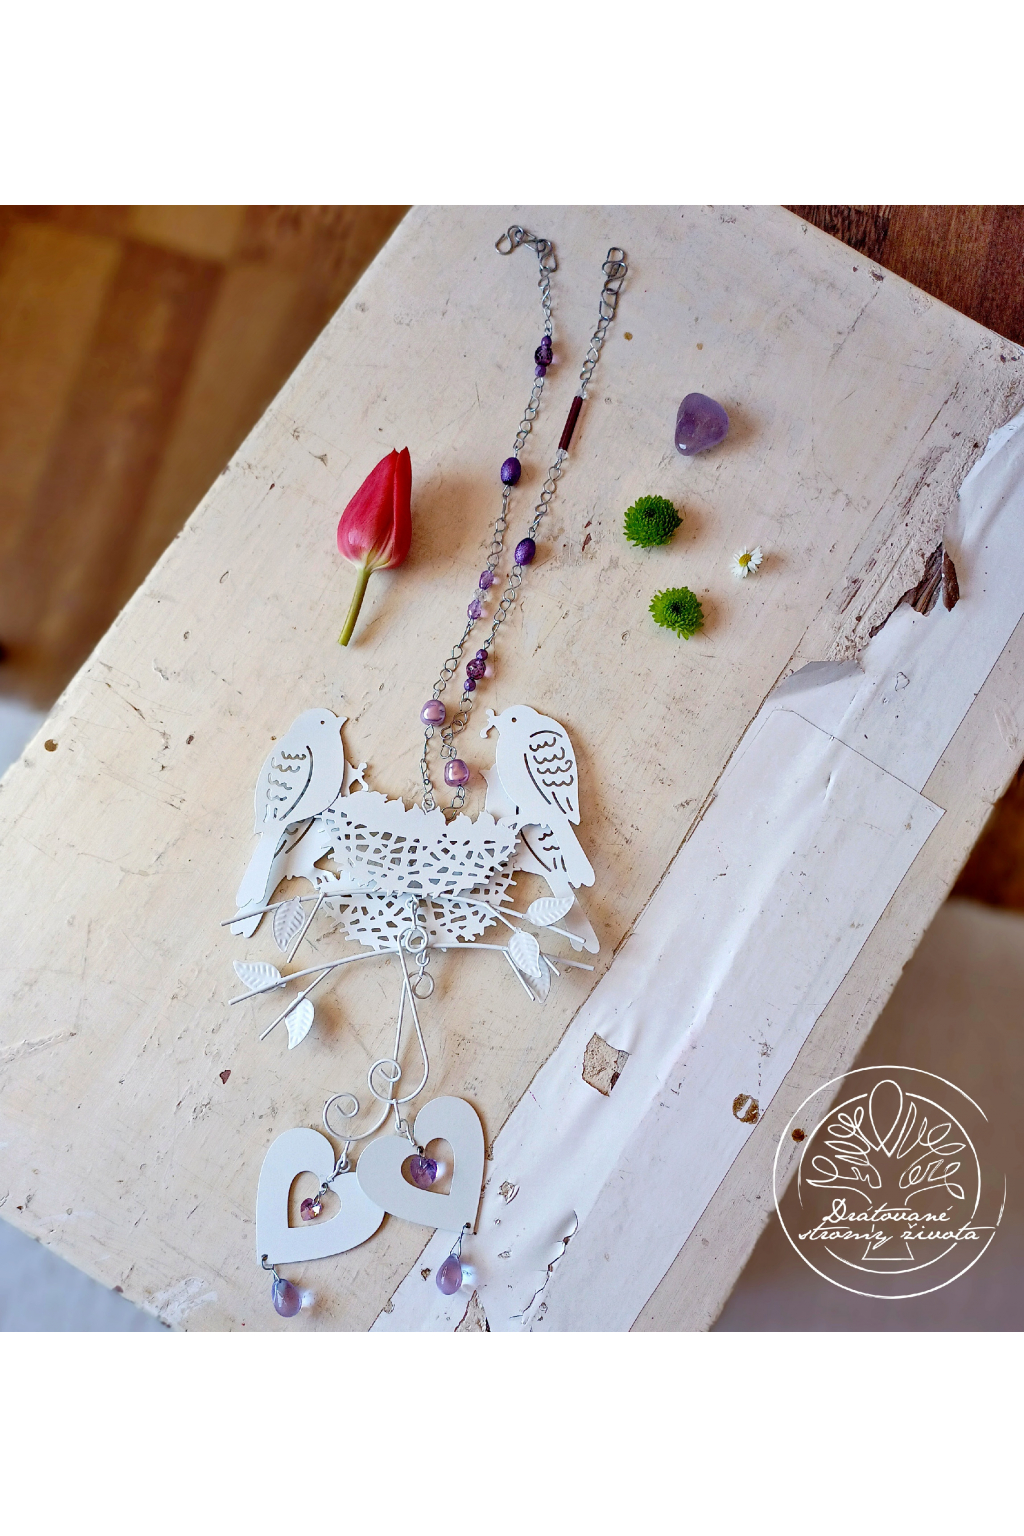 Závěs s ptáčky a srdcem Swarovski - fialový 55cm